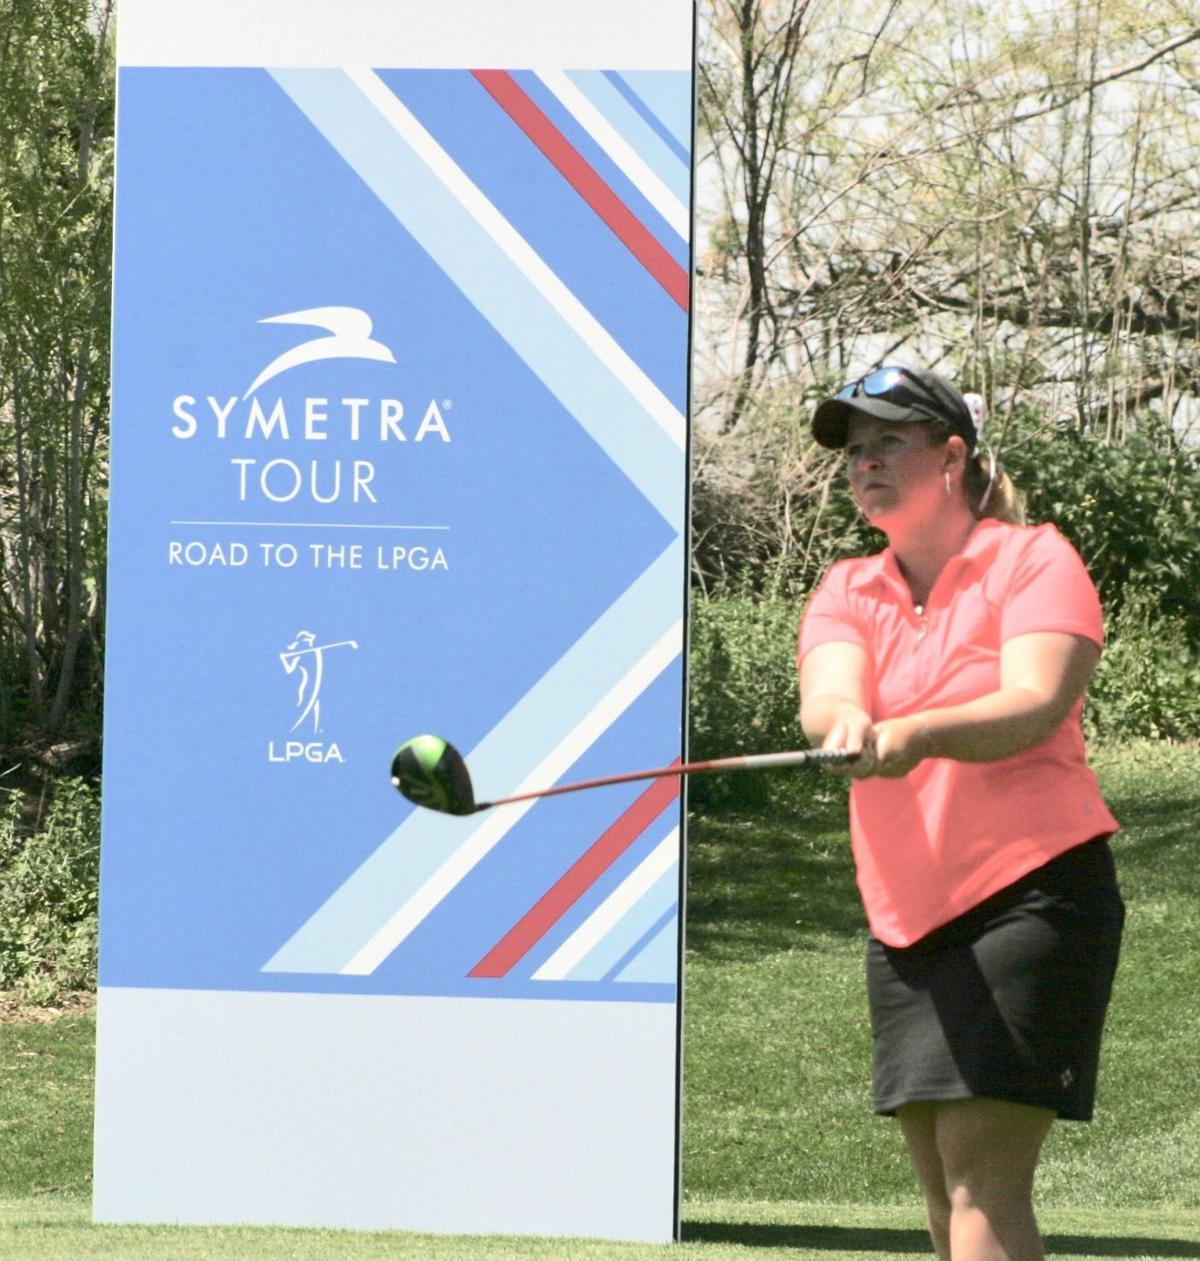 2018 Symetra Tour IOA Championship | Allyssa Ferrell